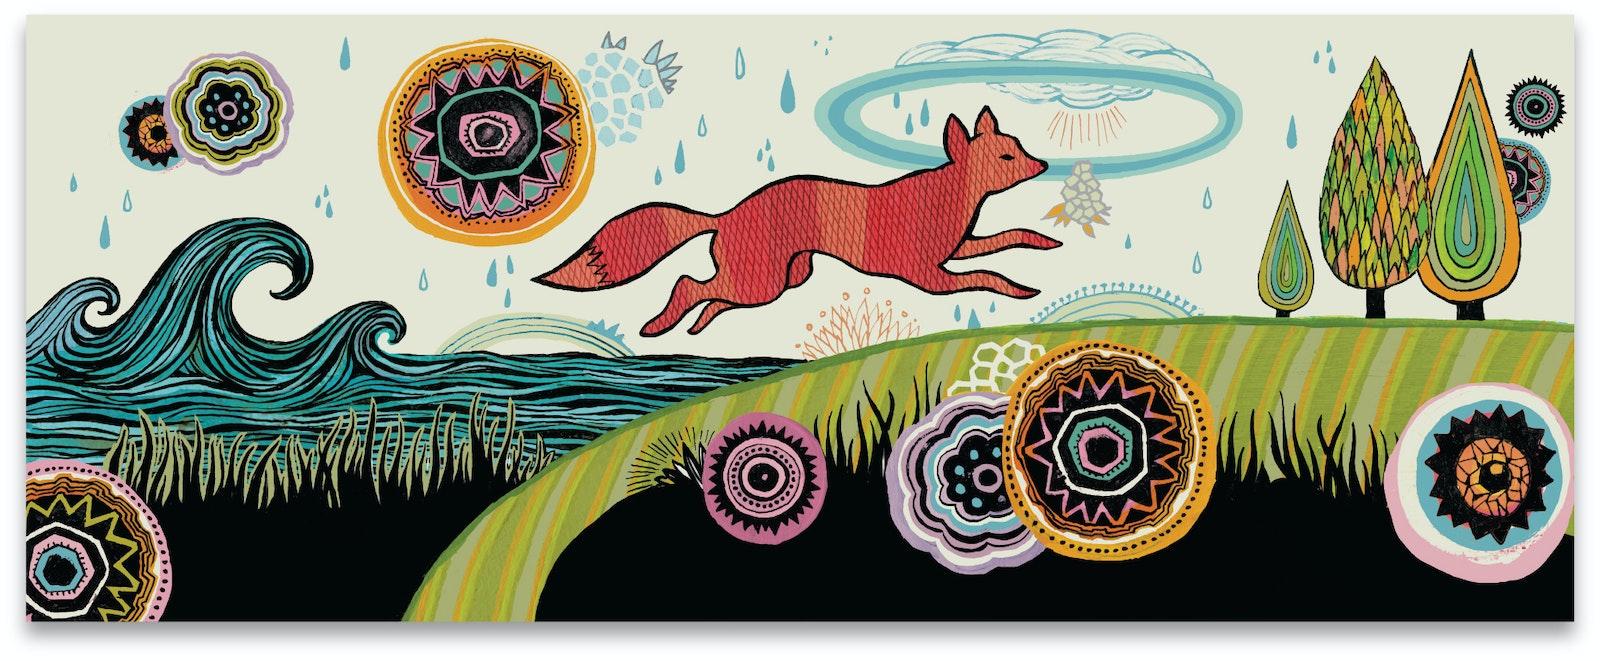 Fox River Illustration A